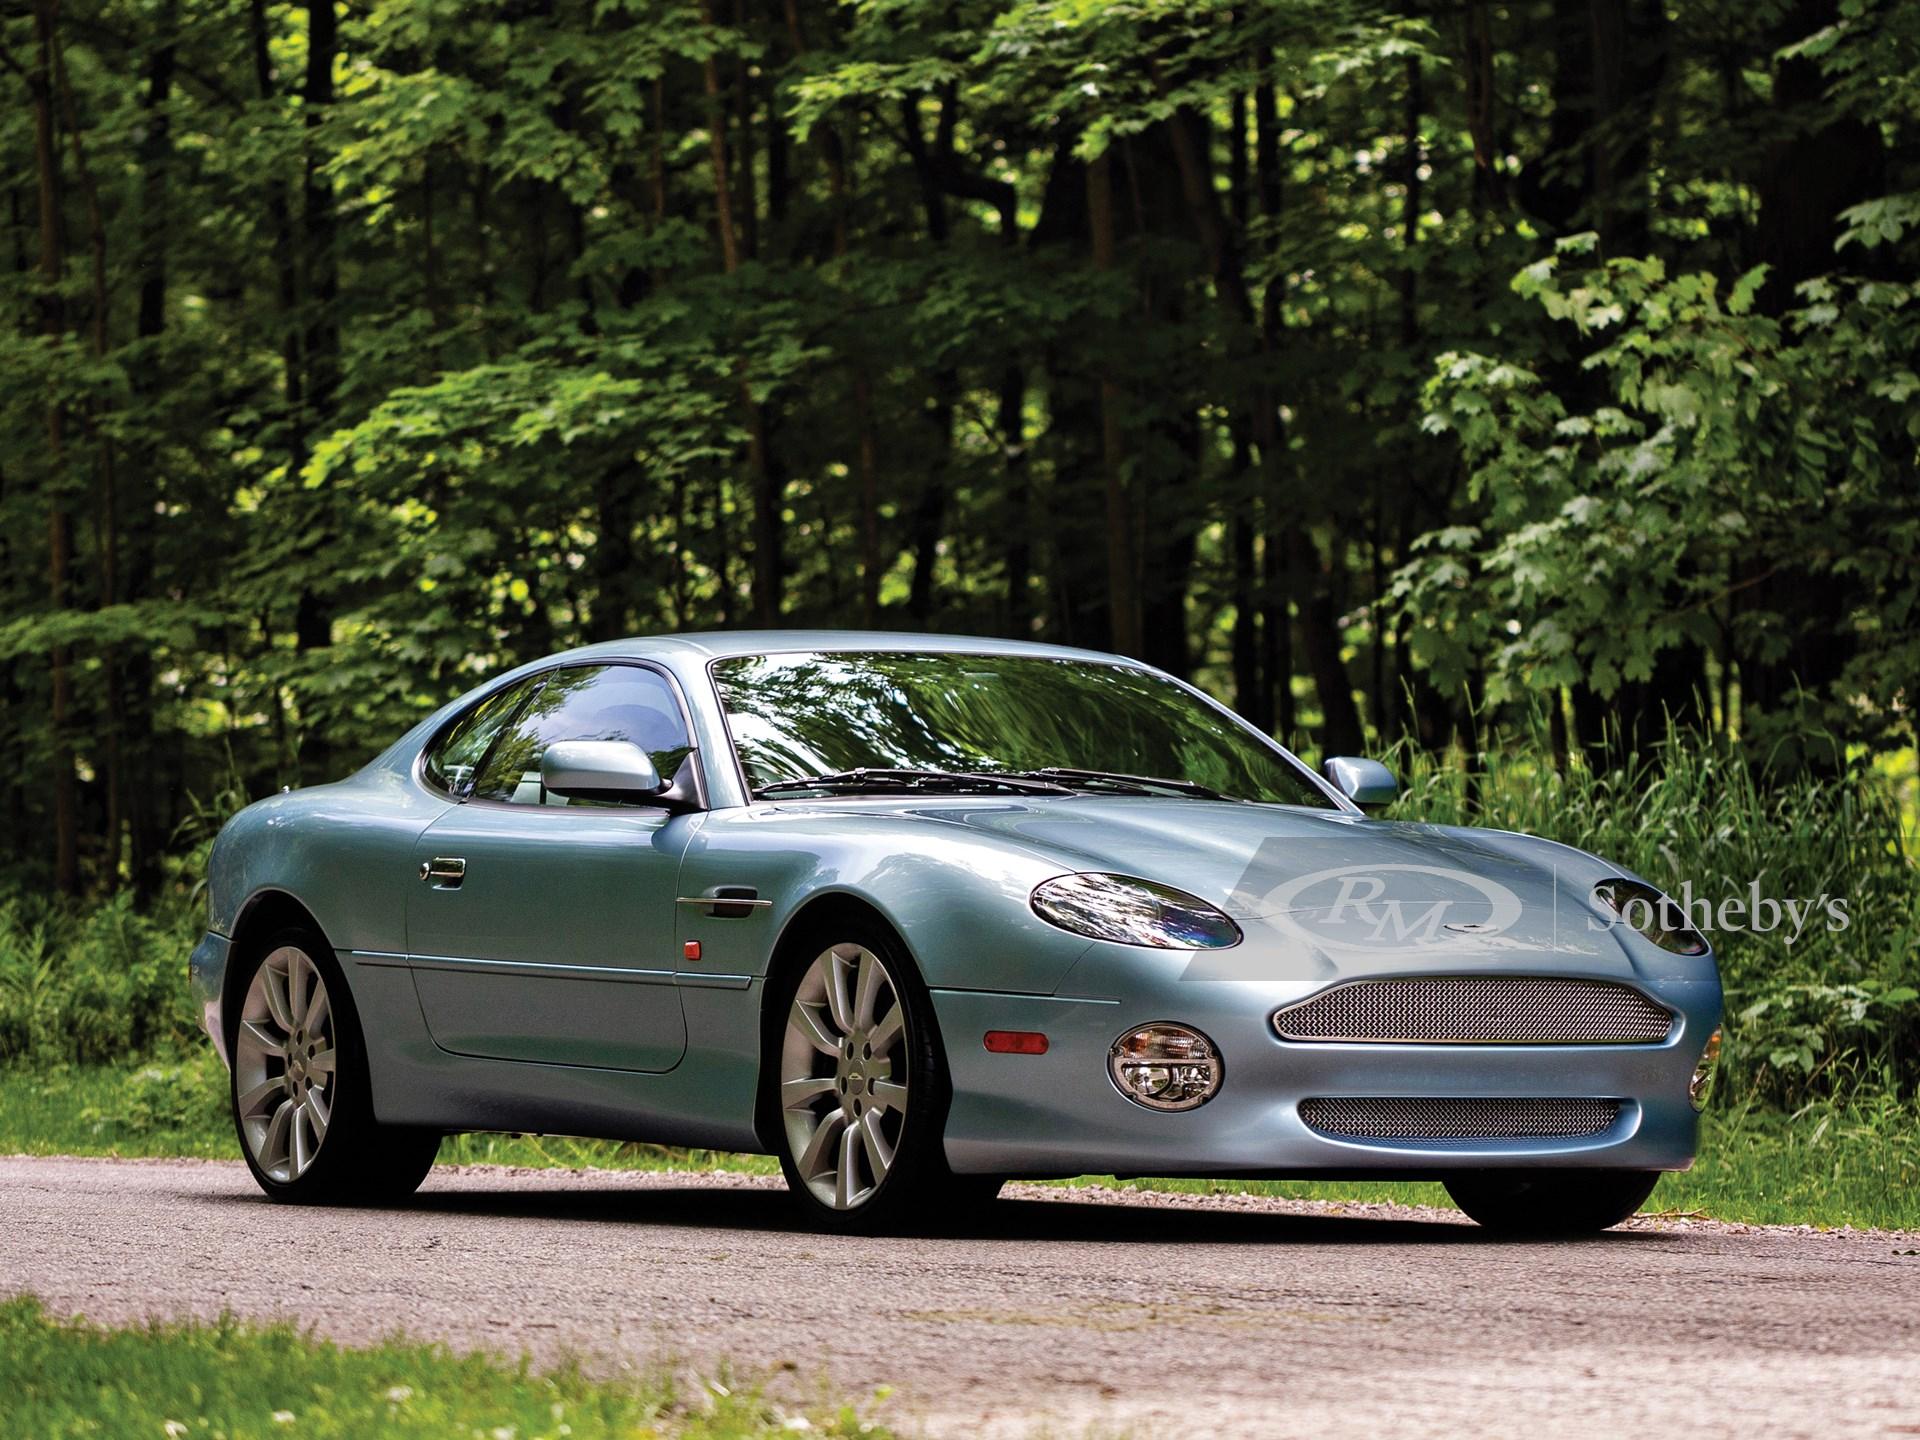 2003 Aston Martin Db7 Vantage Monterey 2019 Rm Sotheby S